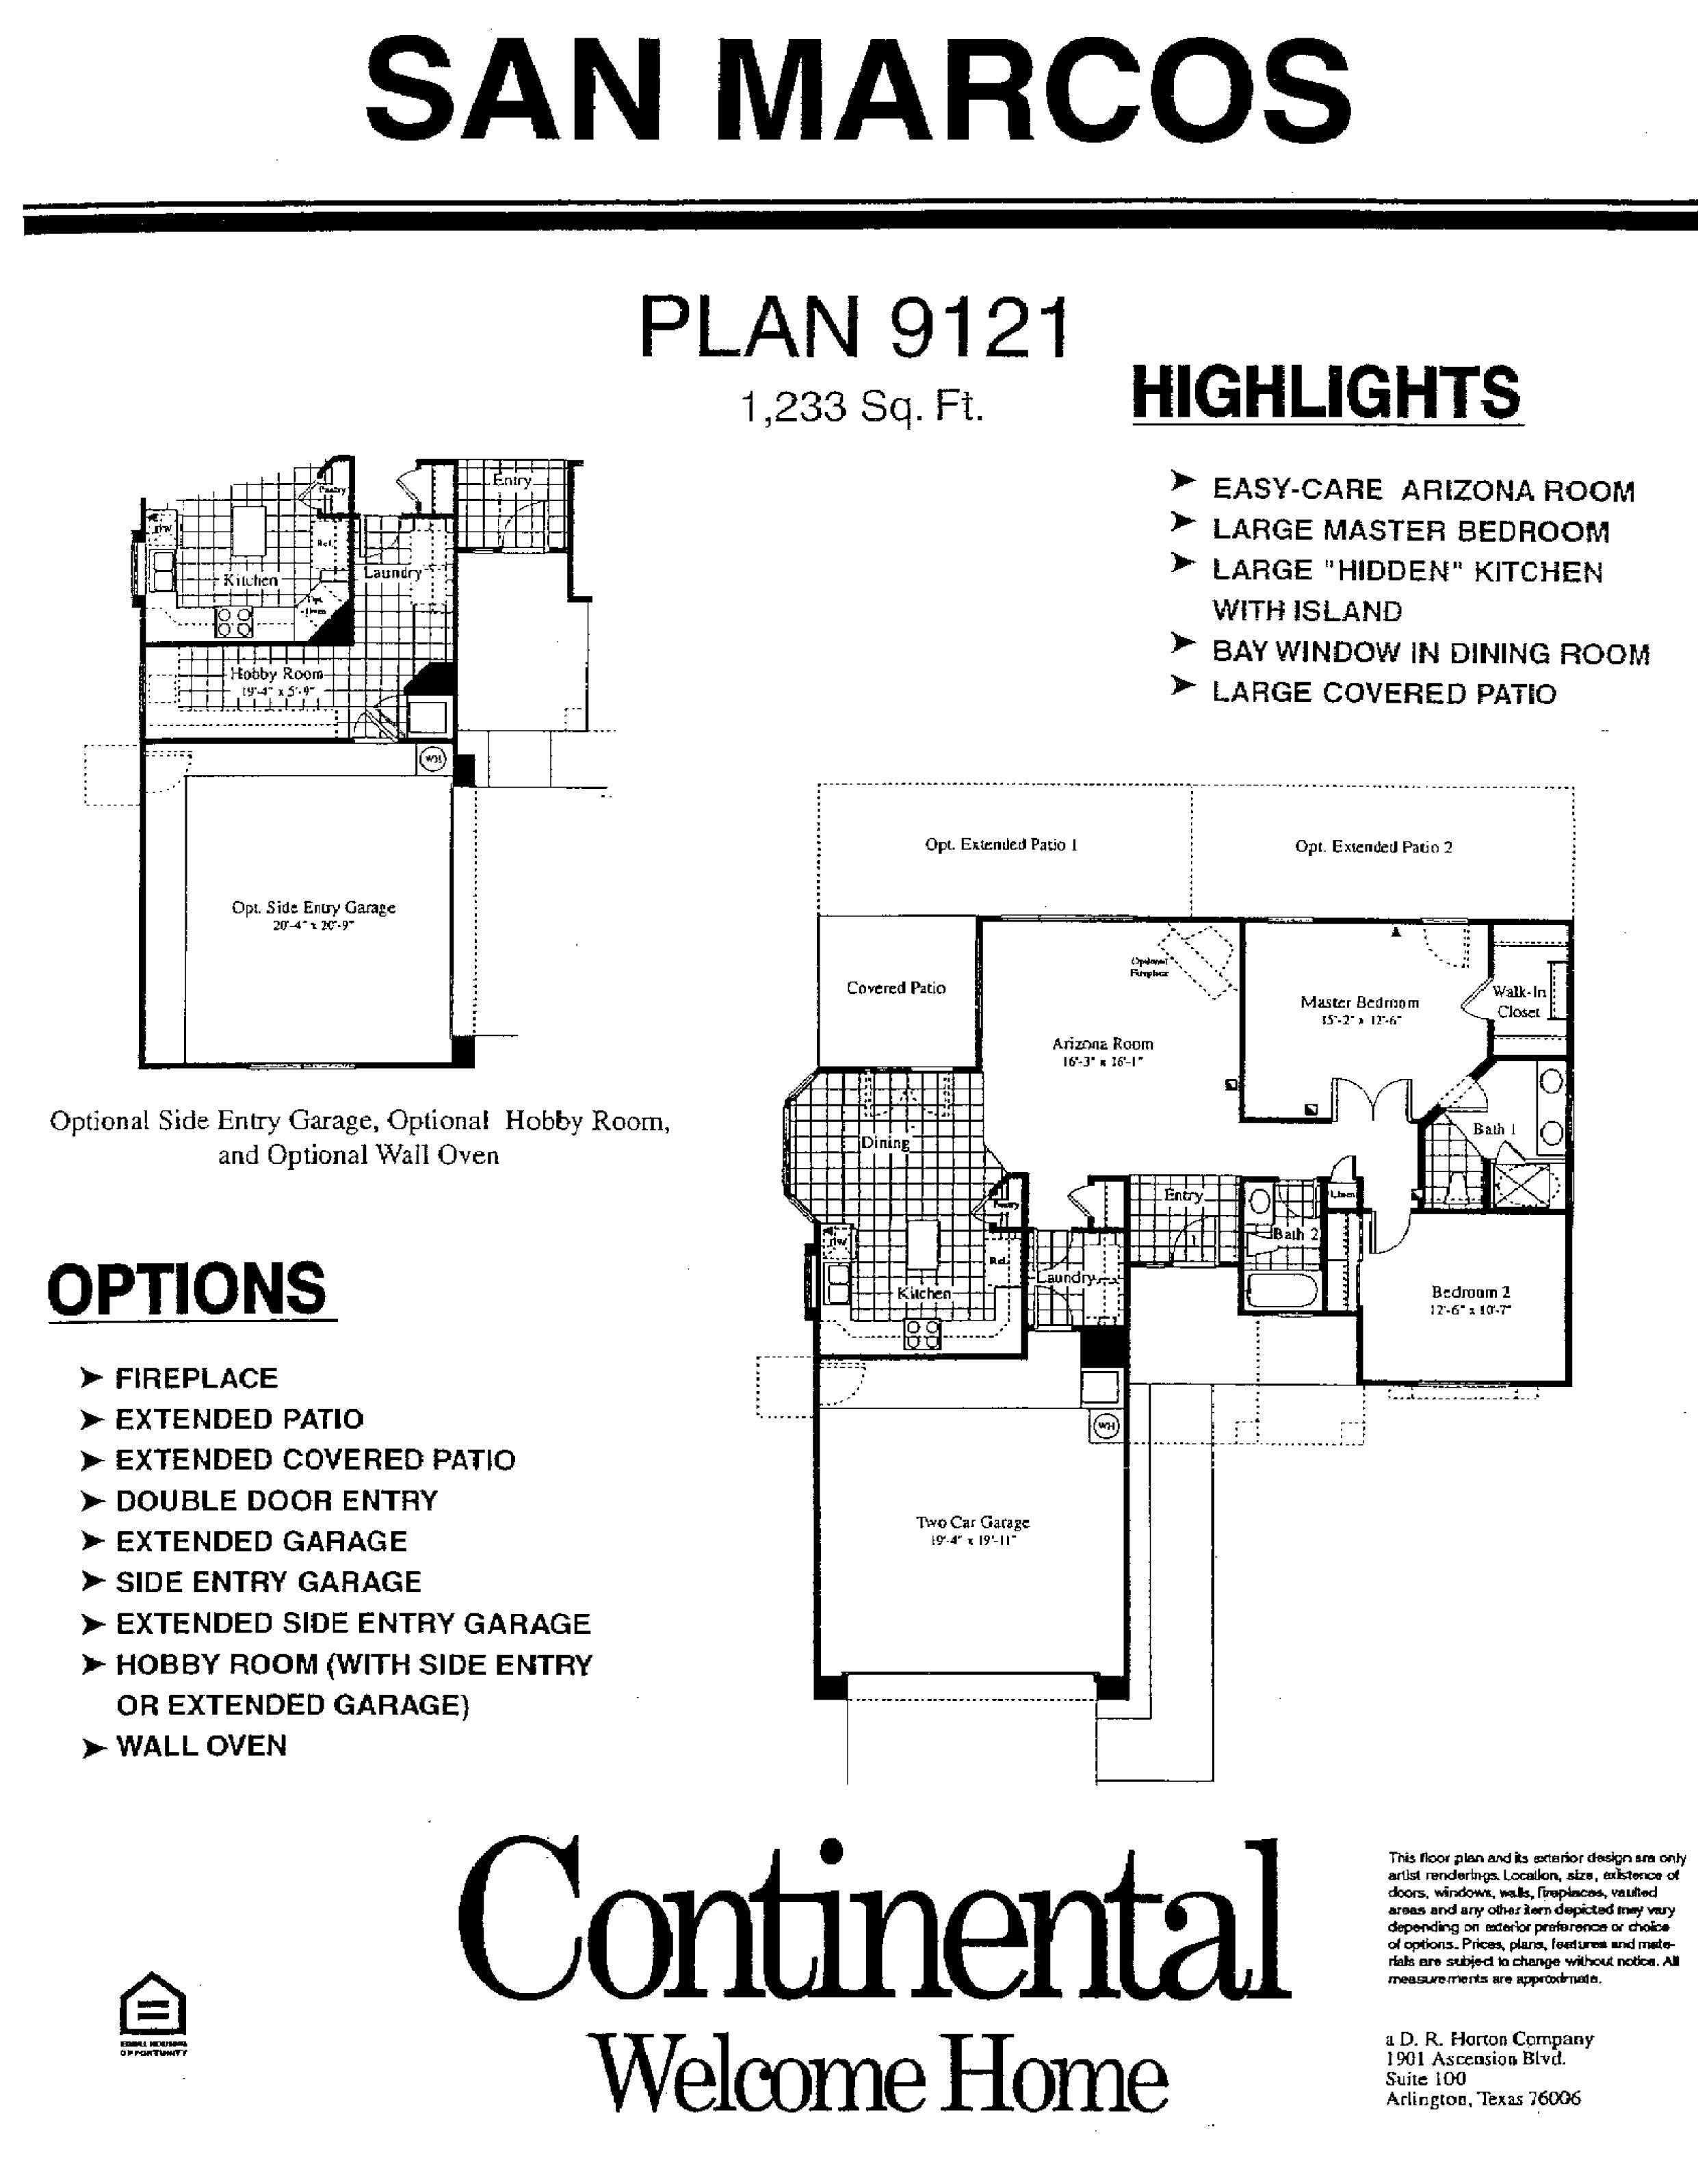 Sun City Festival Floor Plans Arizona Traditions San Marcos Floor Plan Model Home Plans